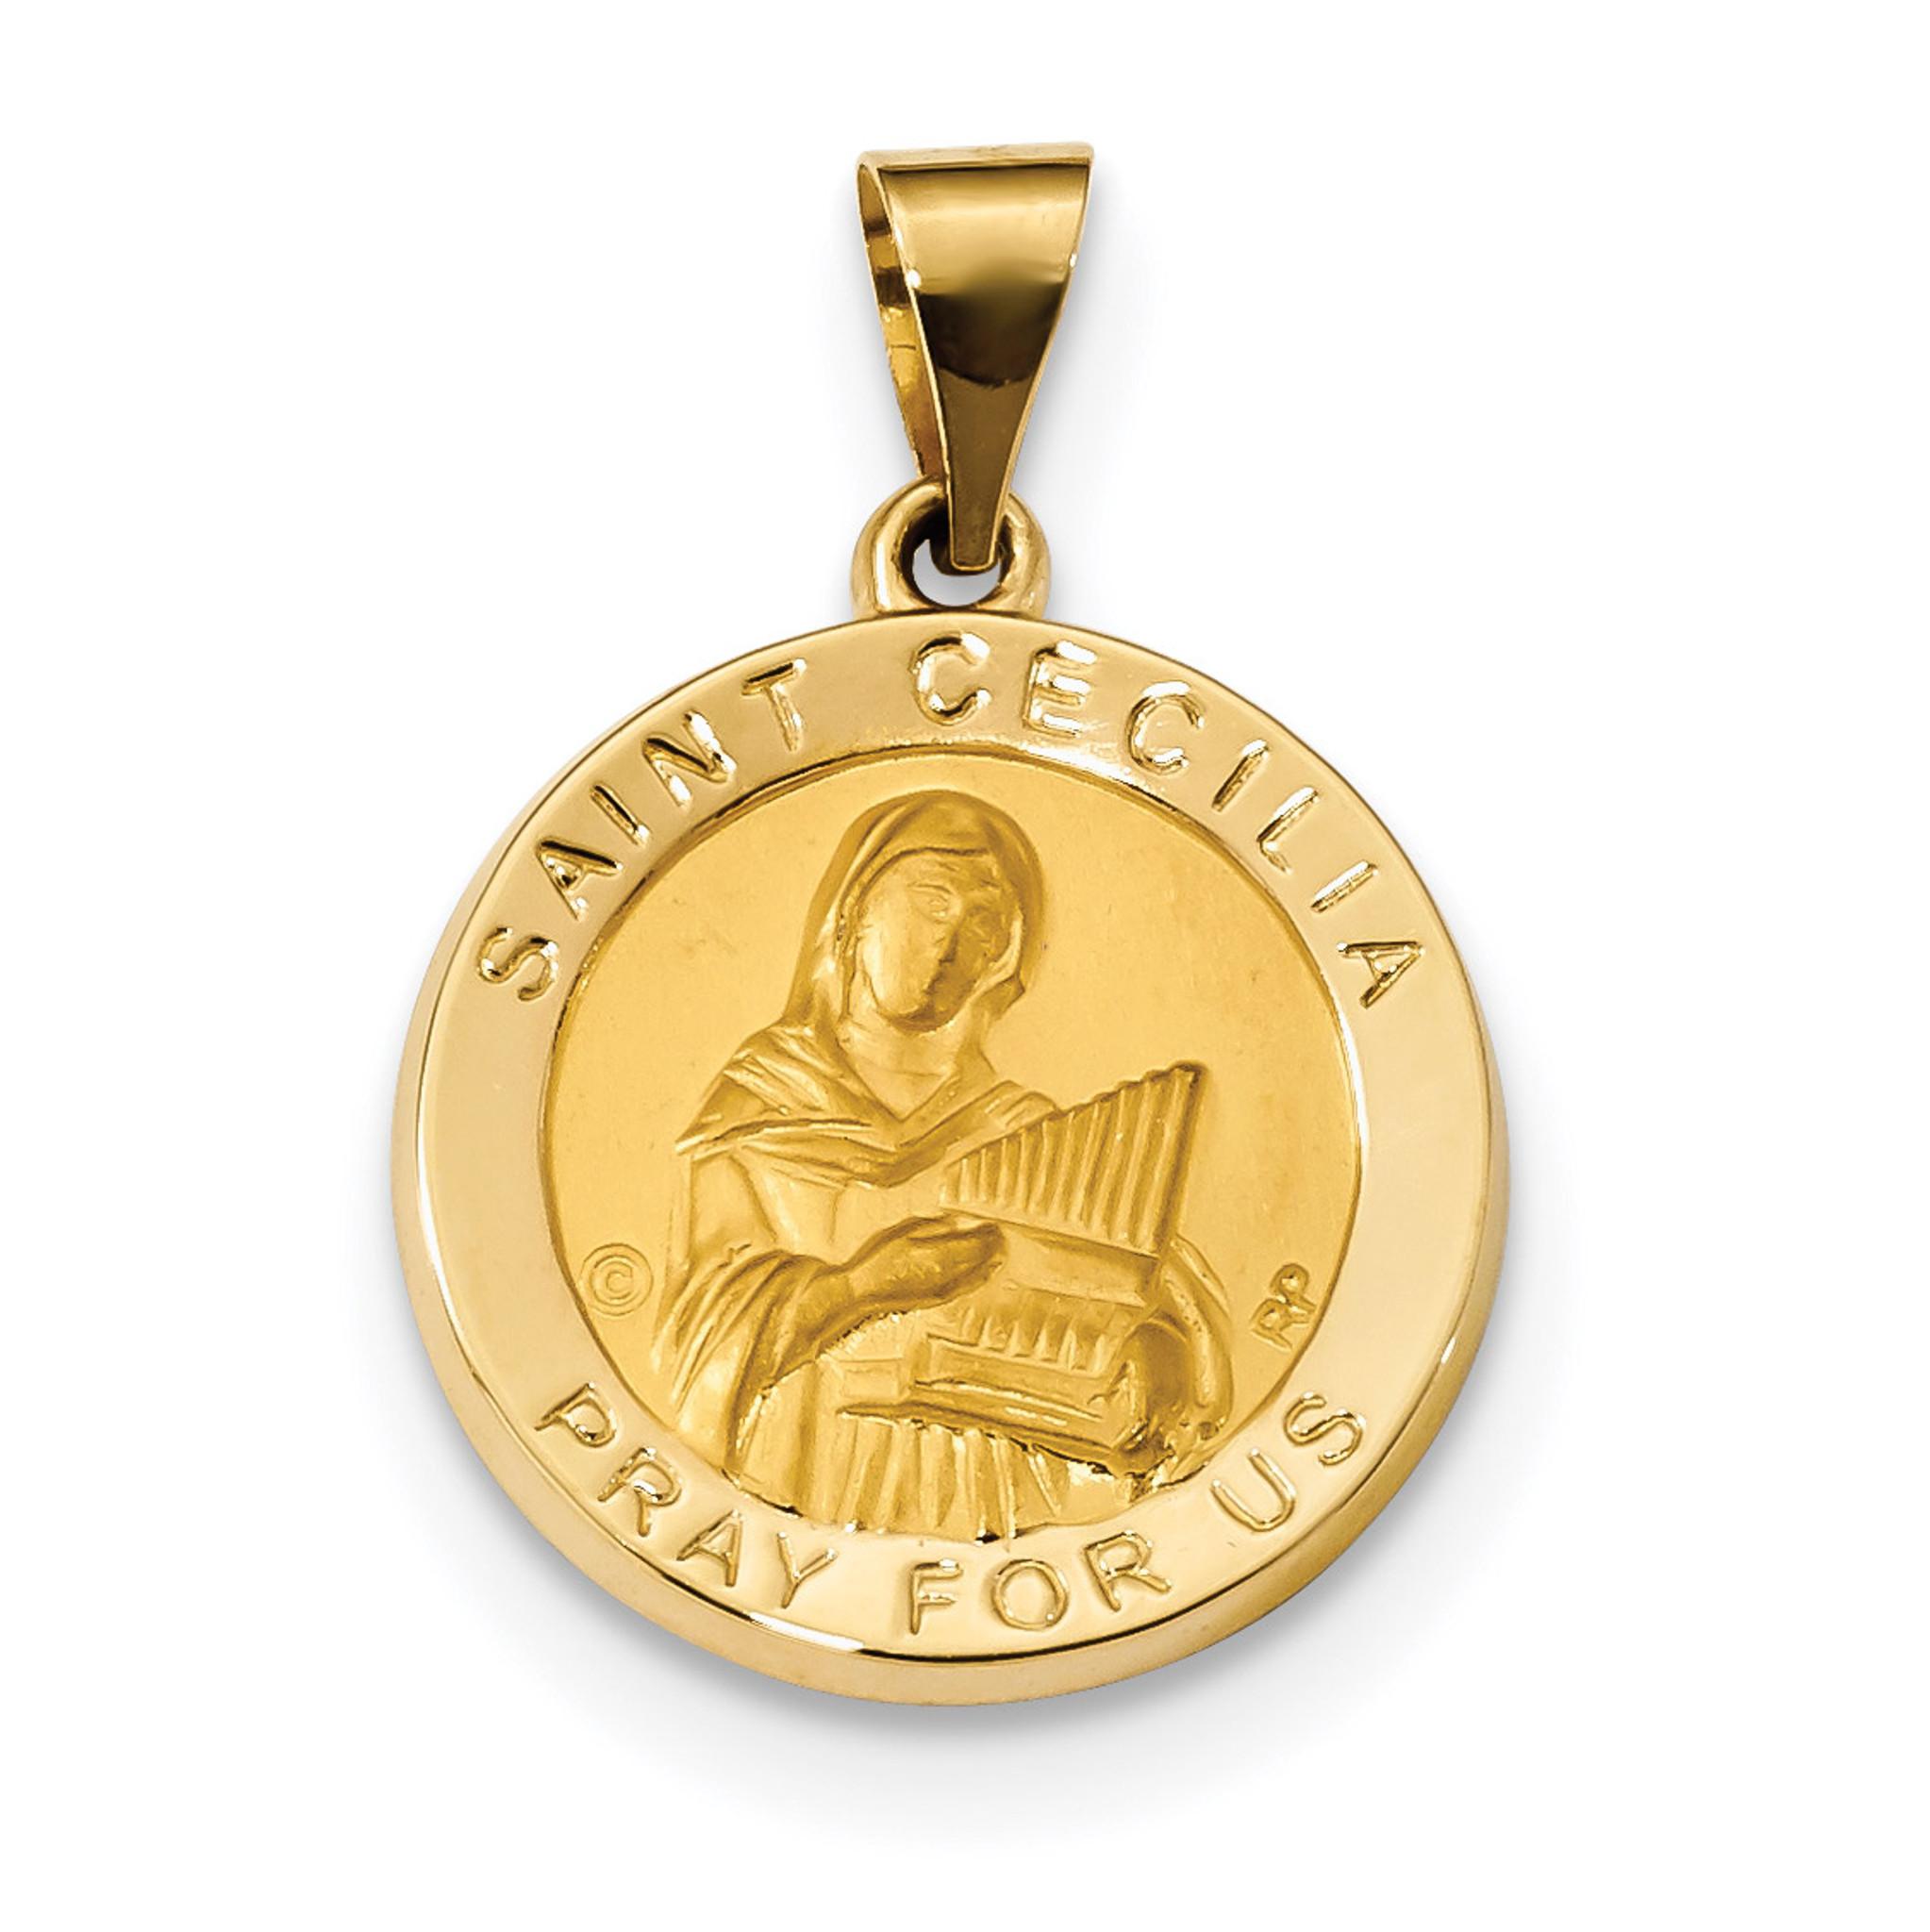 Satin saint cecilia hollow medal pendant 14k gold polished xr1683 satin saint cecilia hollow medal pendant 14k gold polished mpn xr1683 mozeypictures Choice Image